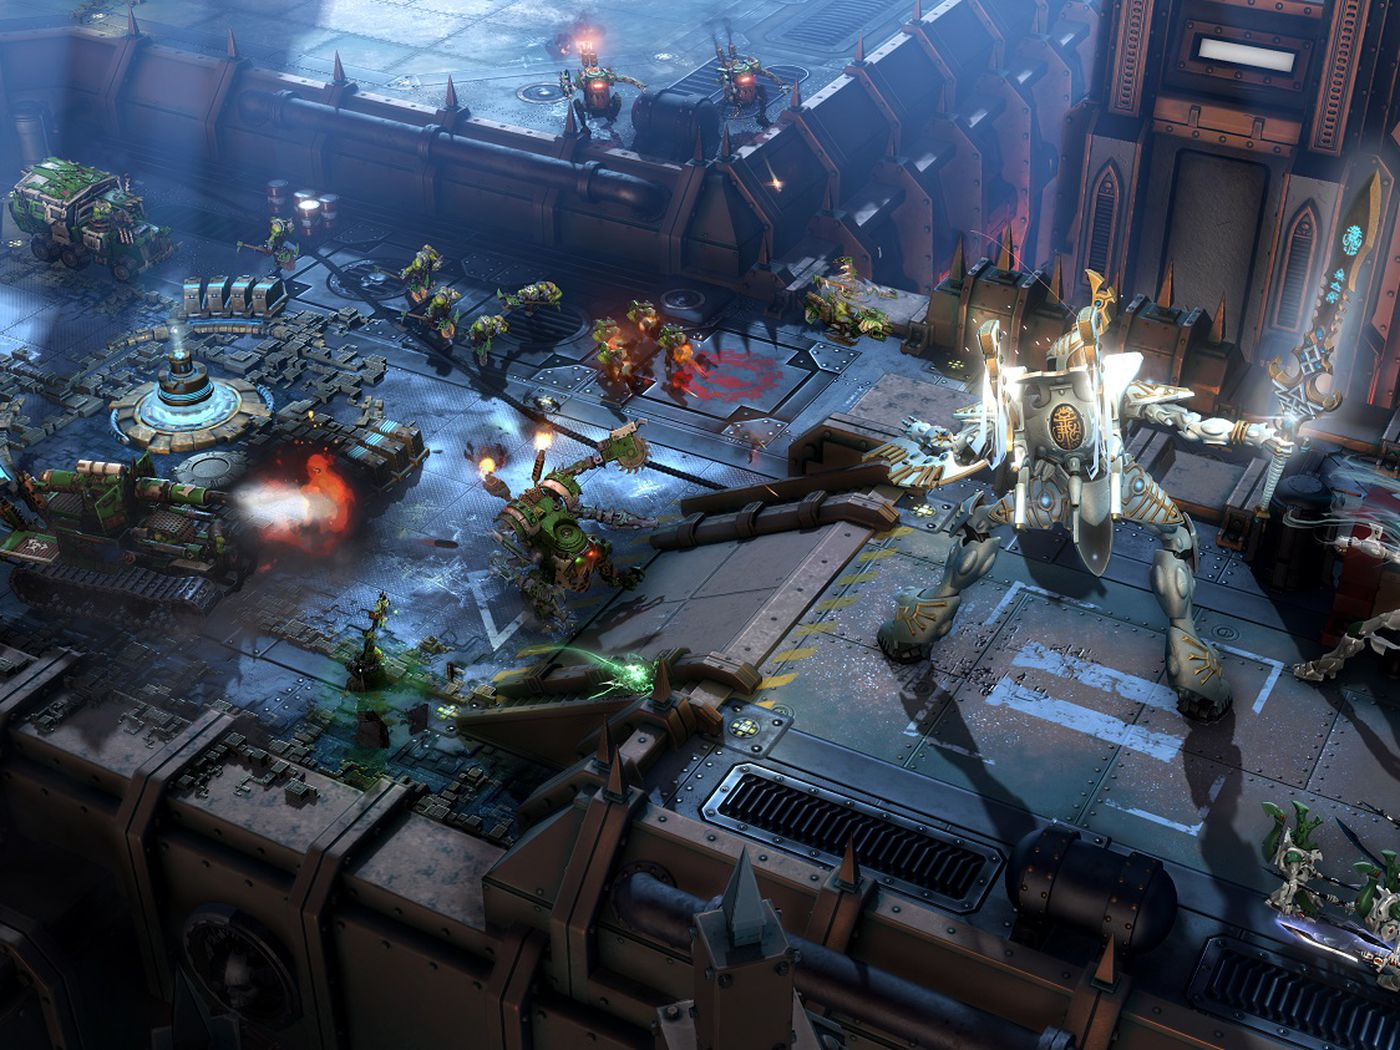 Warhammer 40k dawn of war 2 cheat engine skill points